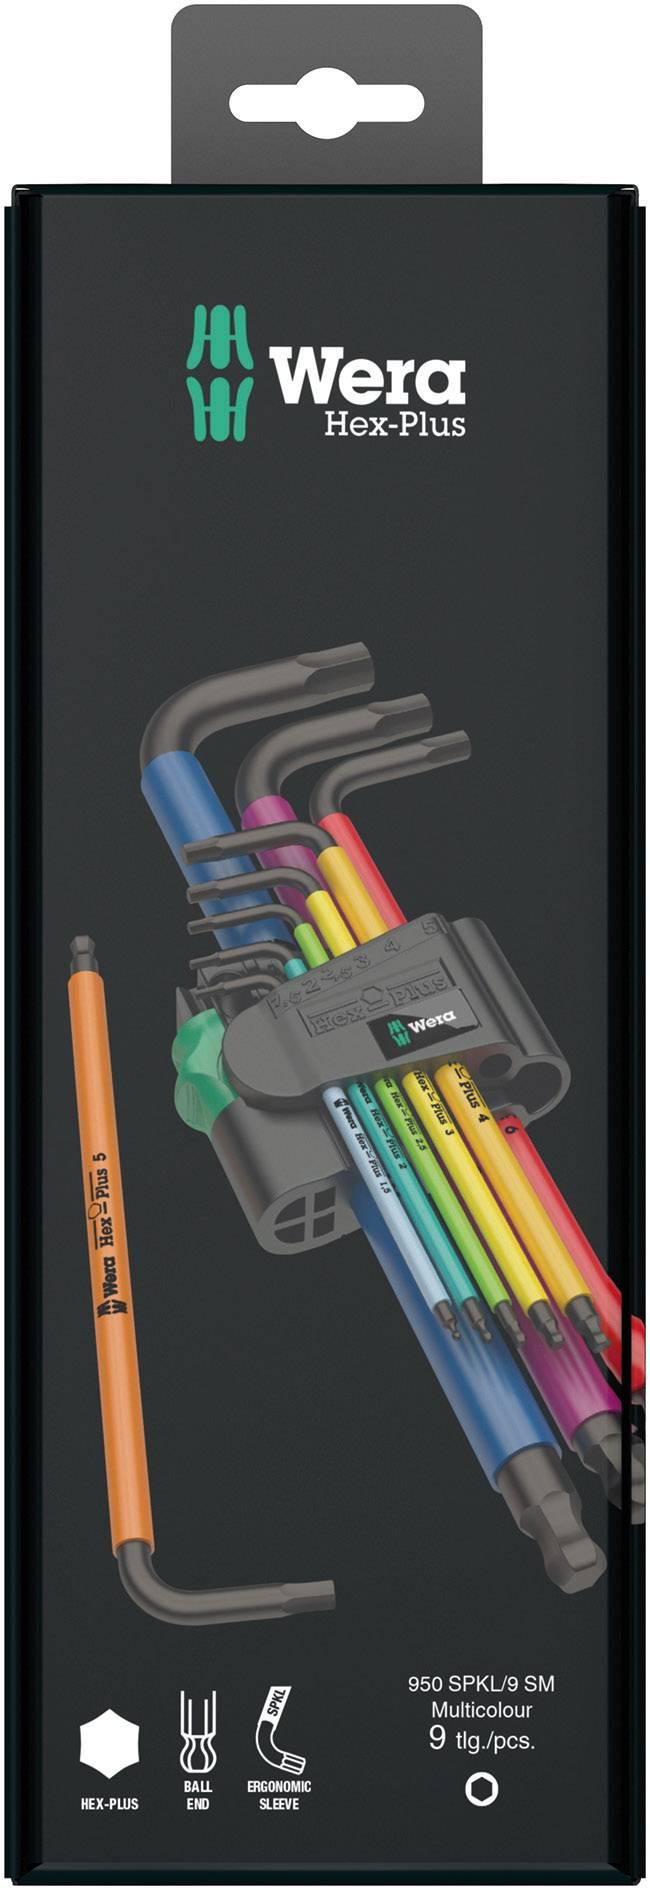 Sada imbusových klíčů Wera Multicolour SB 05073593001, 1,5 - 10 mm, 9 ks